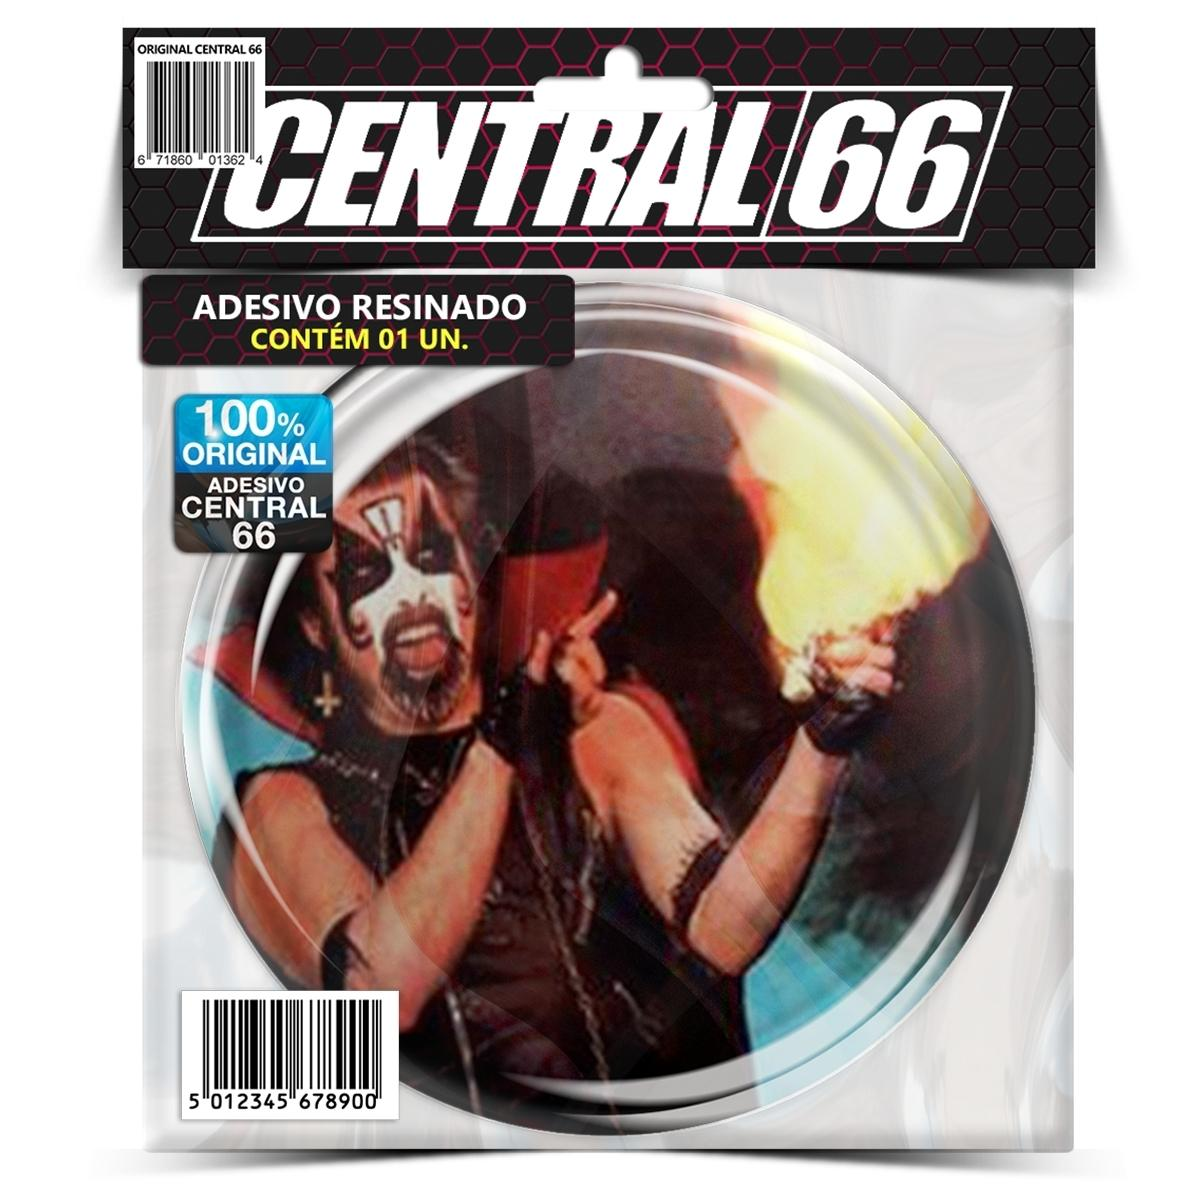 Adesivo Redondo Pink Floyd The Wall – Central 66